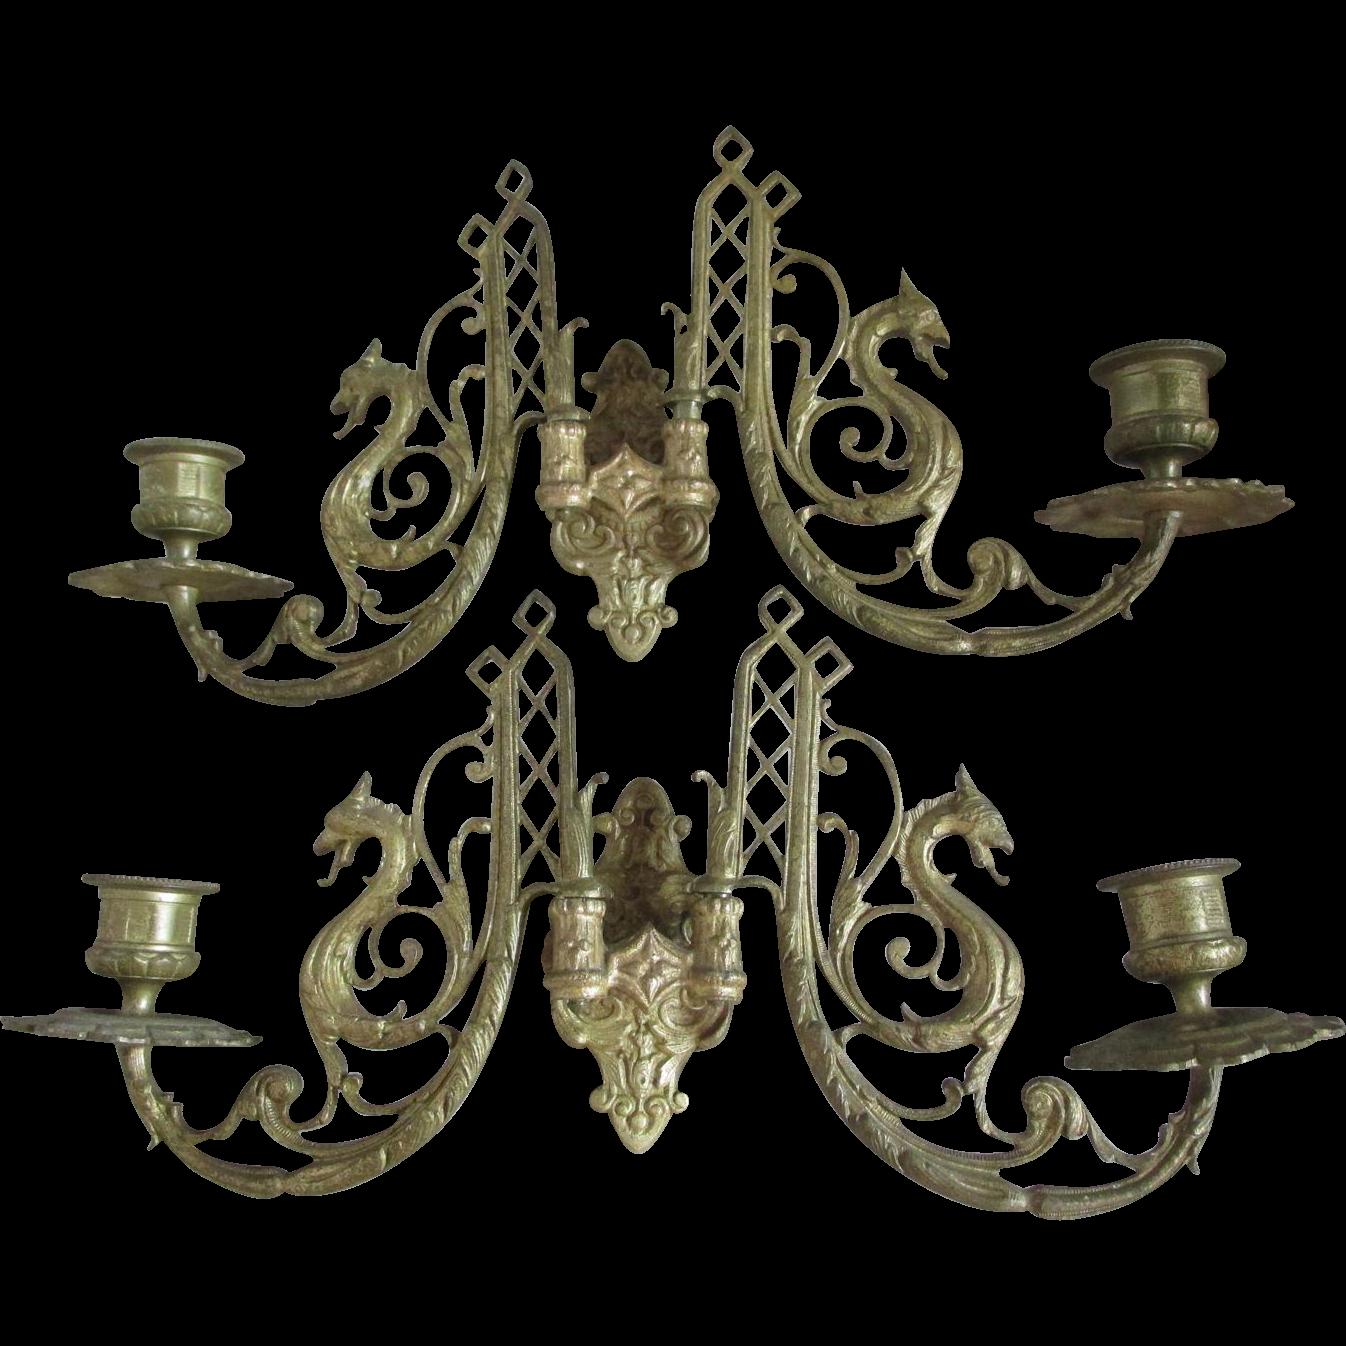 Pair Gothic Gargoyle Candle Sconces, Candlesticks from neatcurios on Ruby Lane